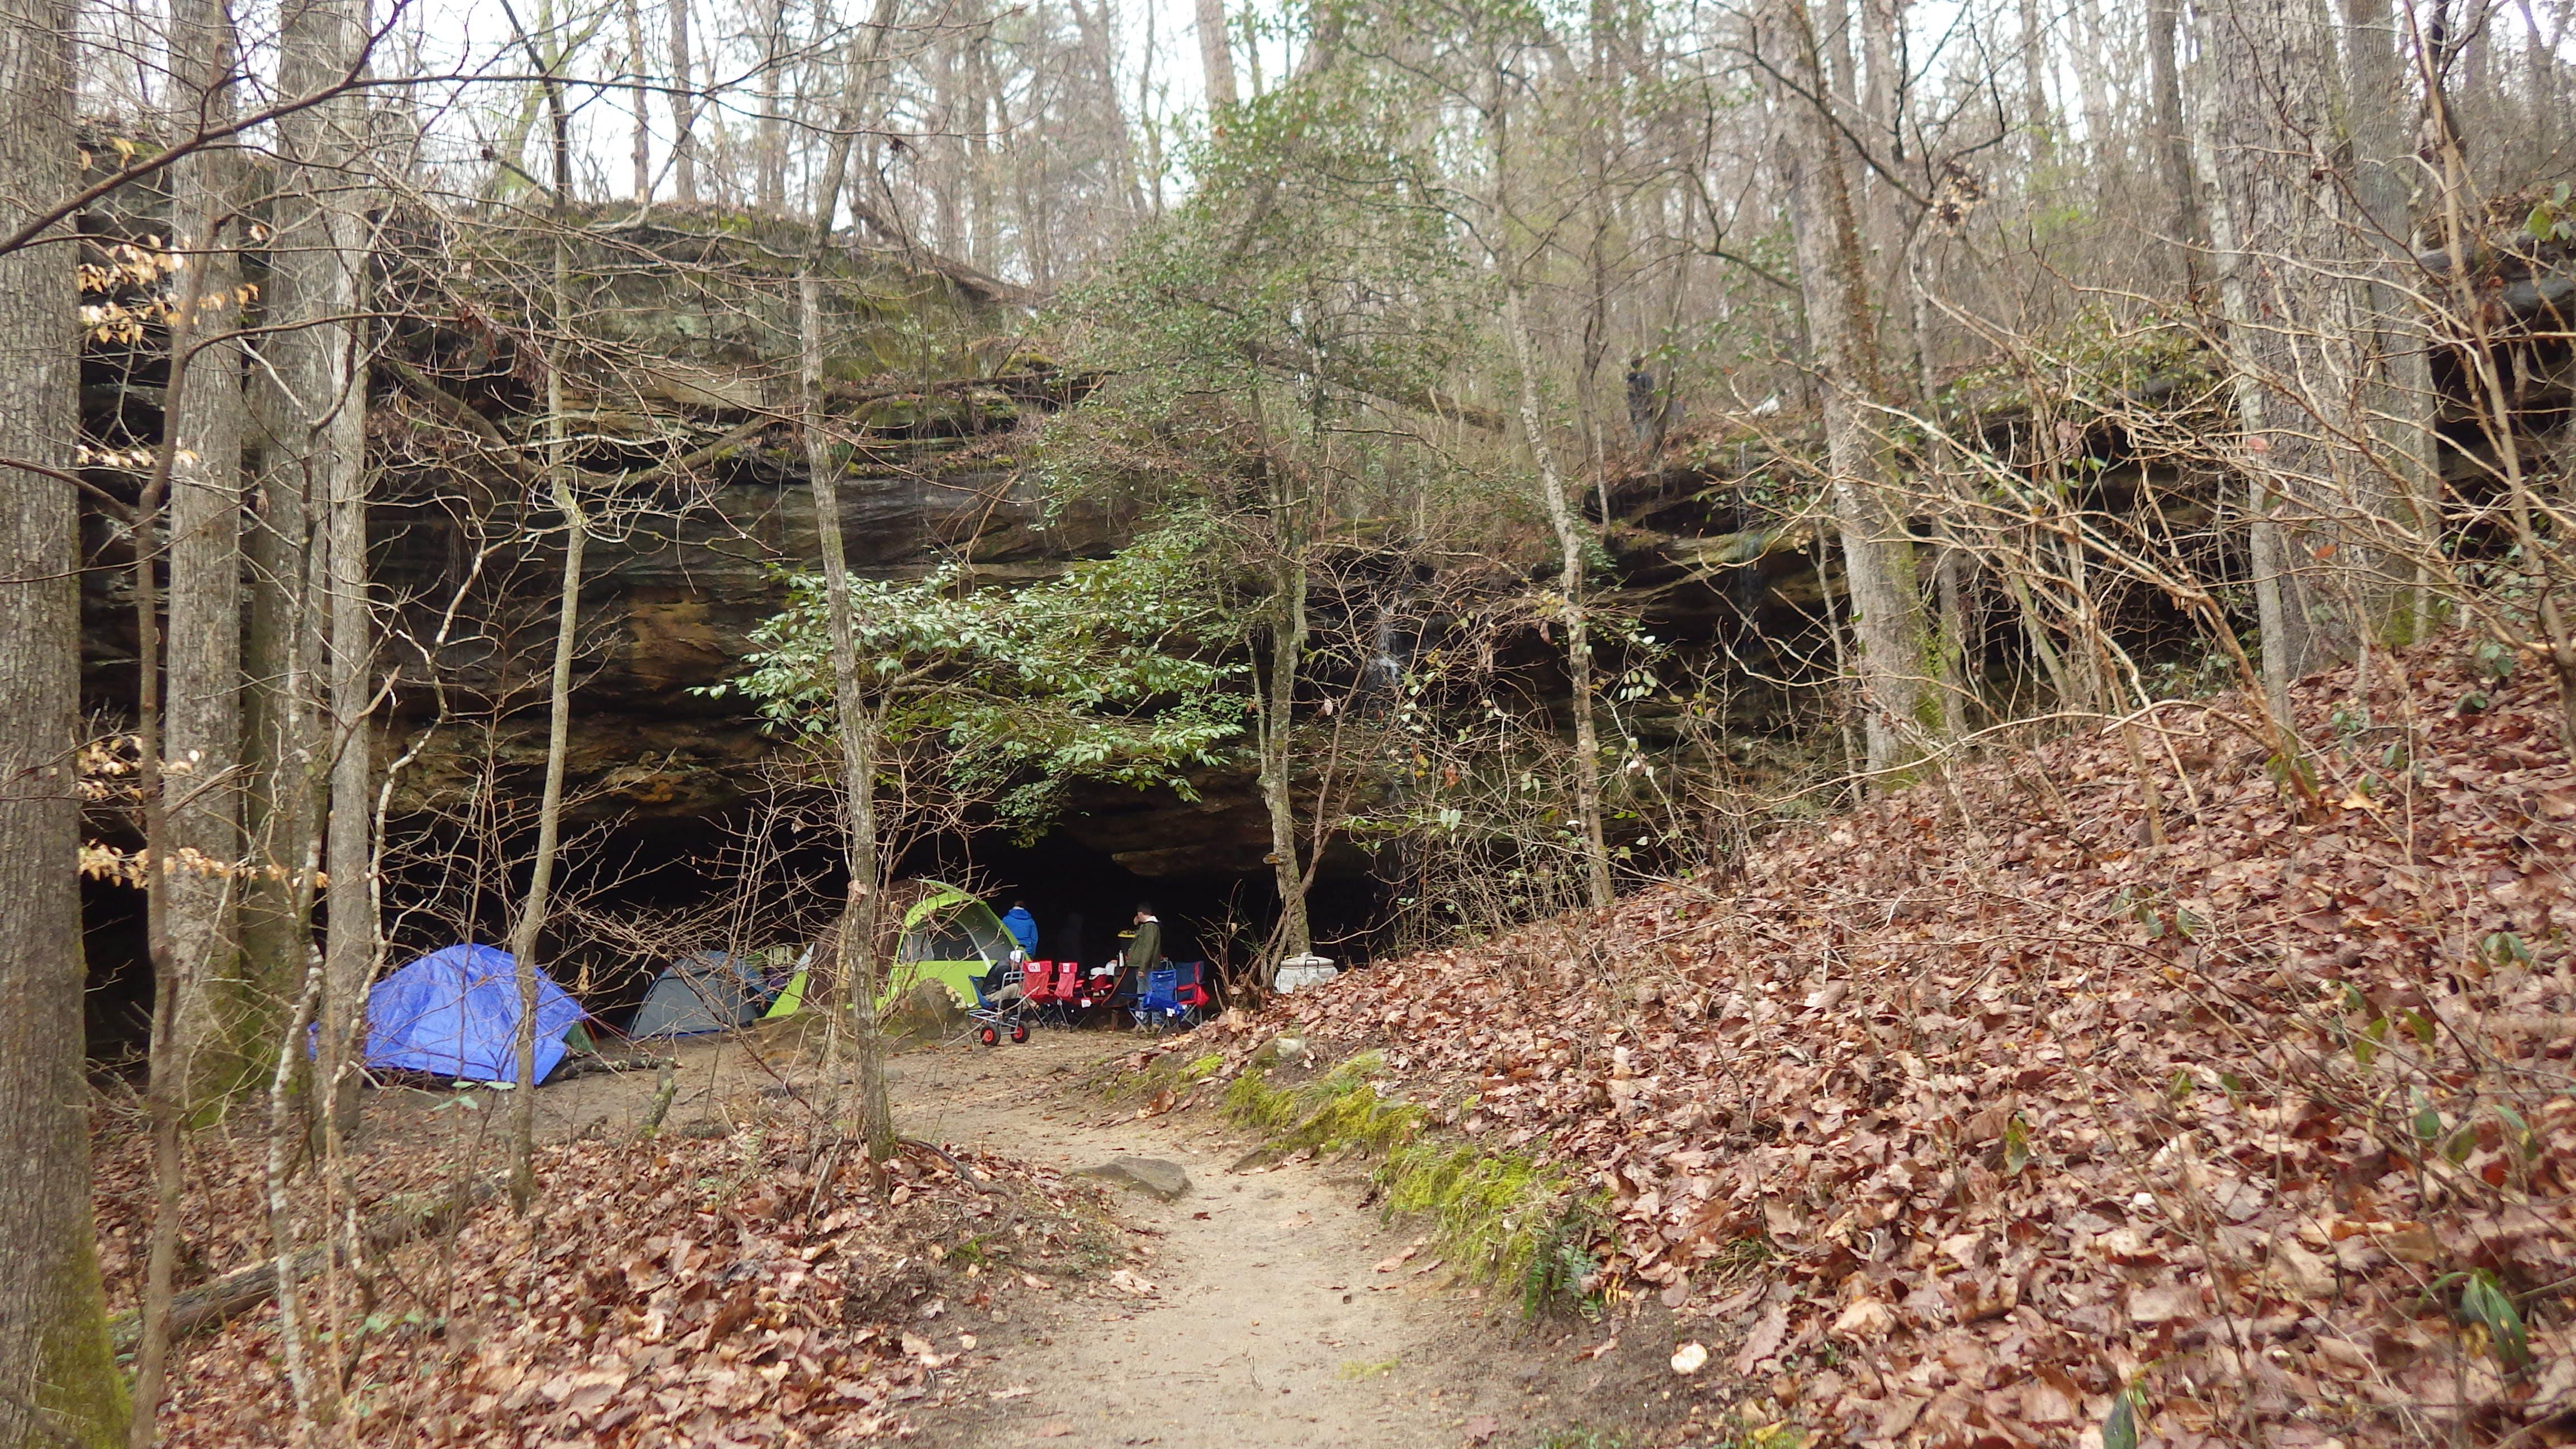 Dismals Canyon Cabins and Primitive Campsites, AL | The Dyrt